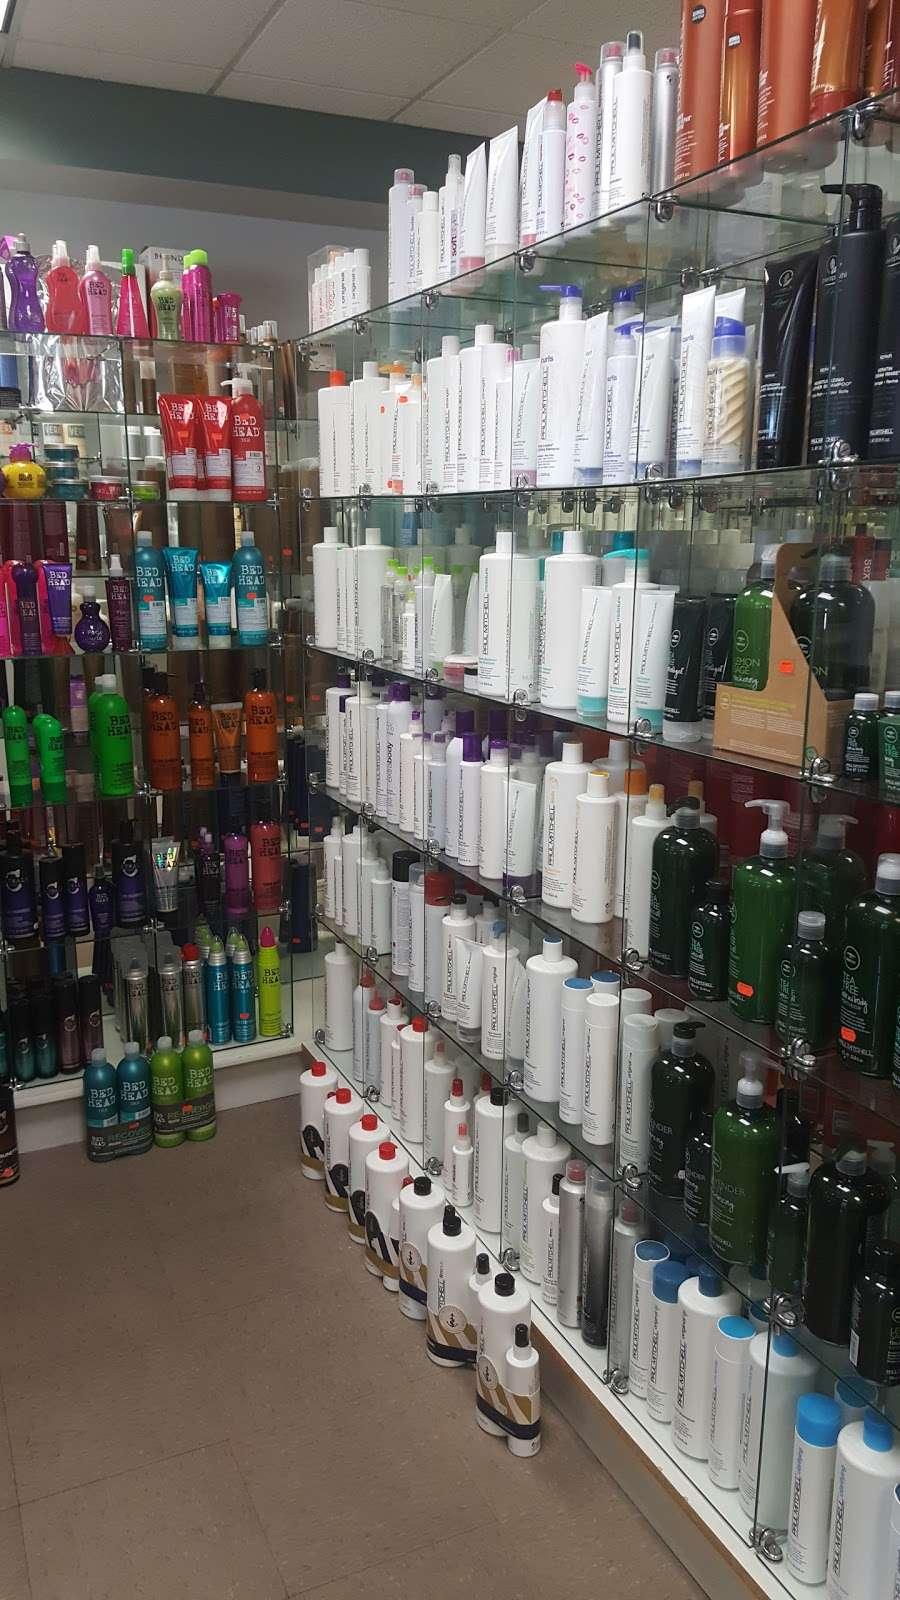 Helens Beauty Supply & Salon - hair care  | Photo 5 of 9 | Address: 15760 La Forge St, Whittier, CA 90603, USA | Phone: (562) 943-7313